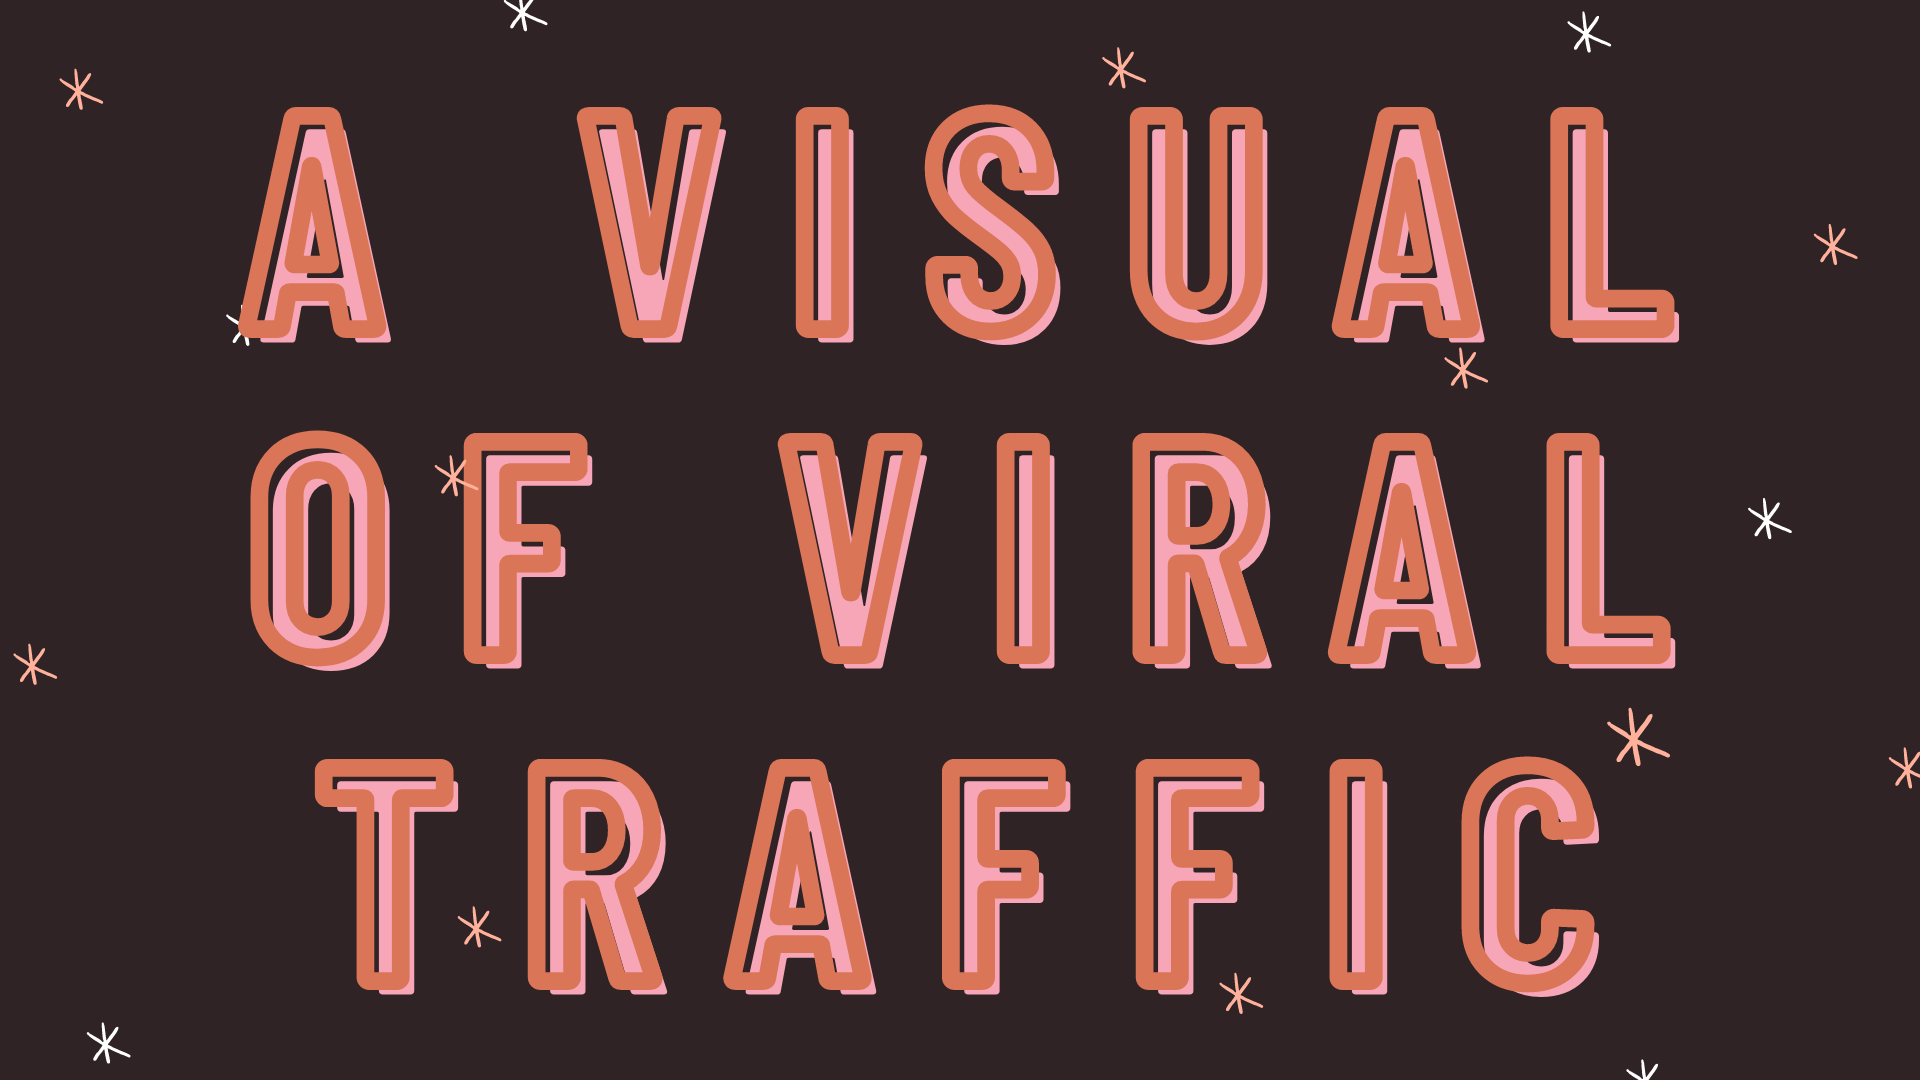 a visual of viral traffic